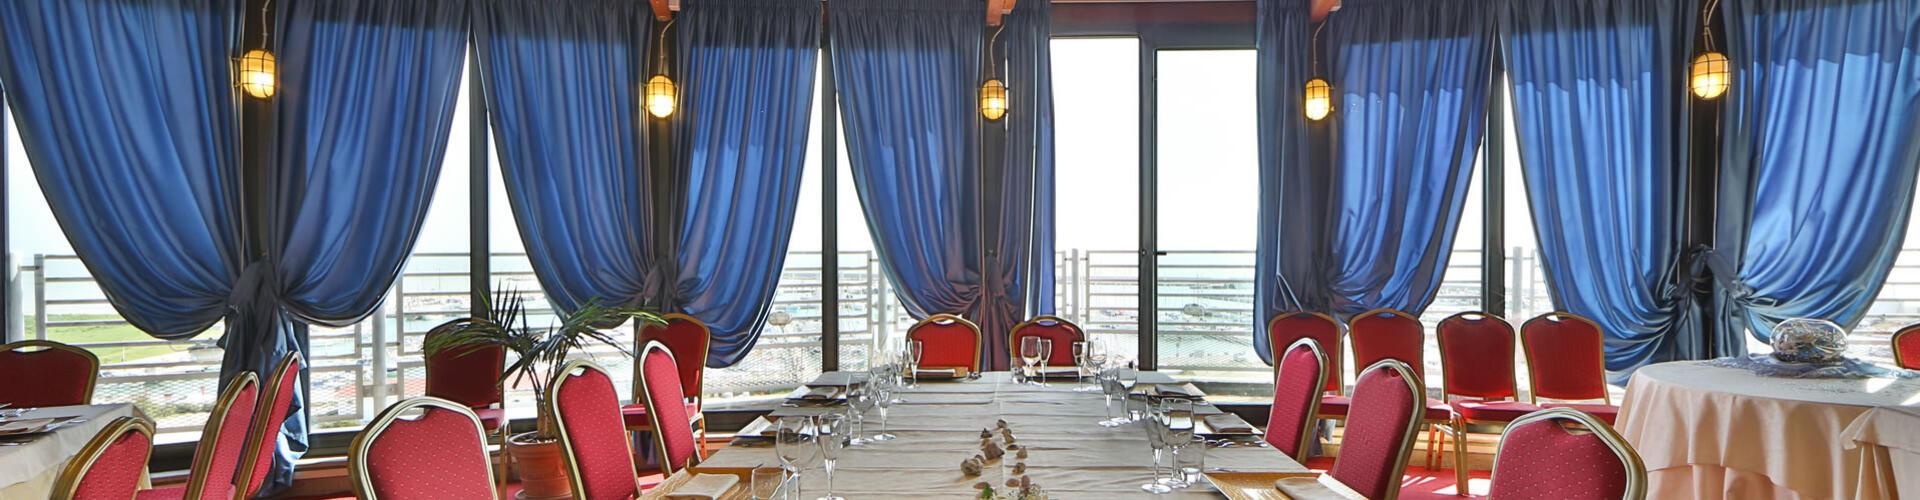 hoteldavidpalace de restaurant 001